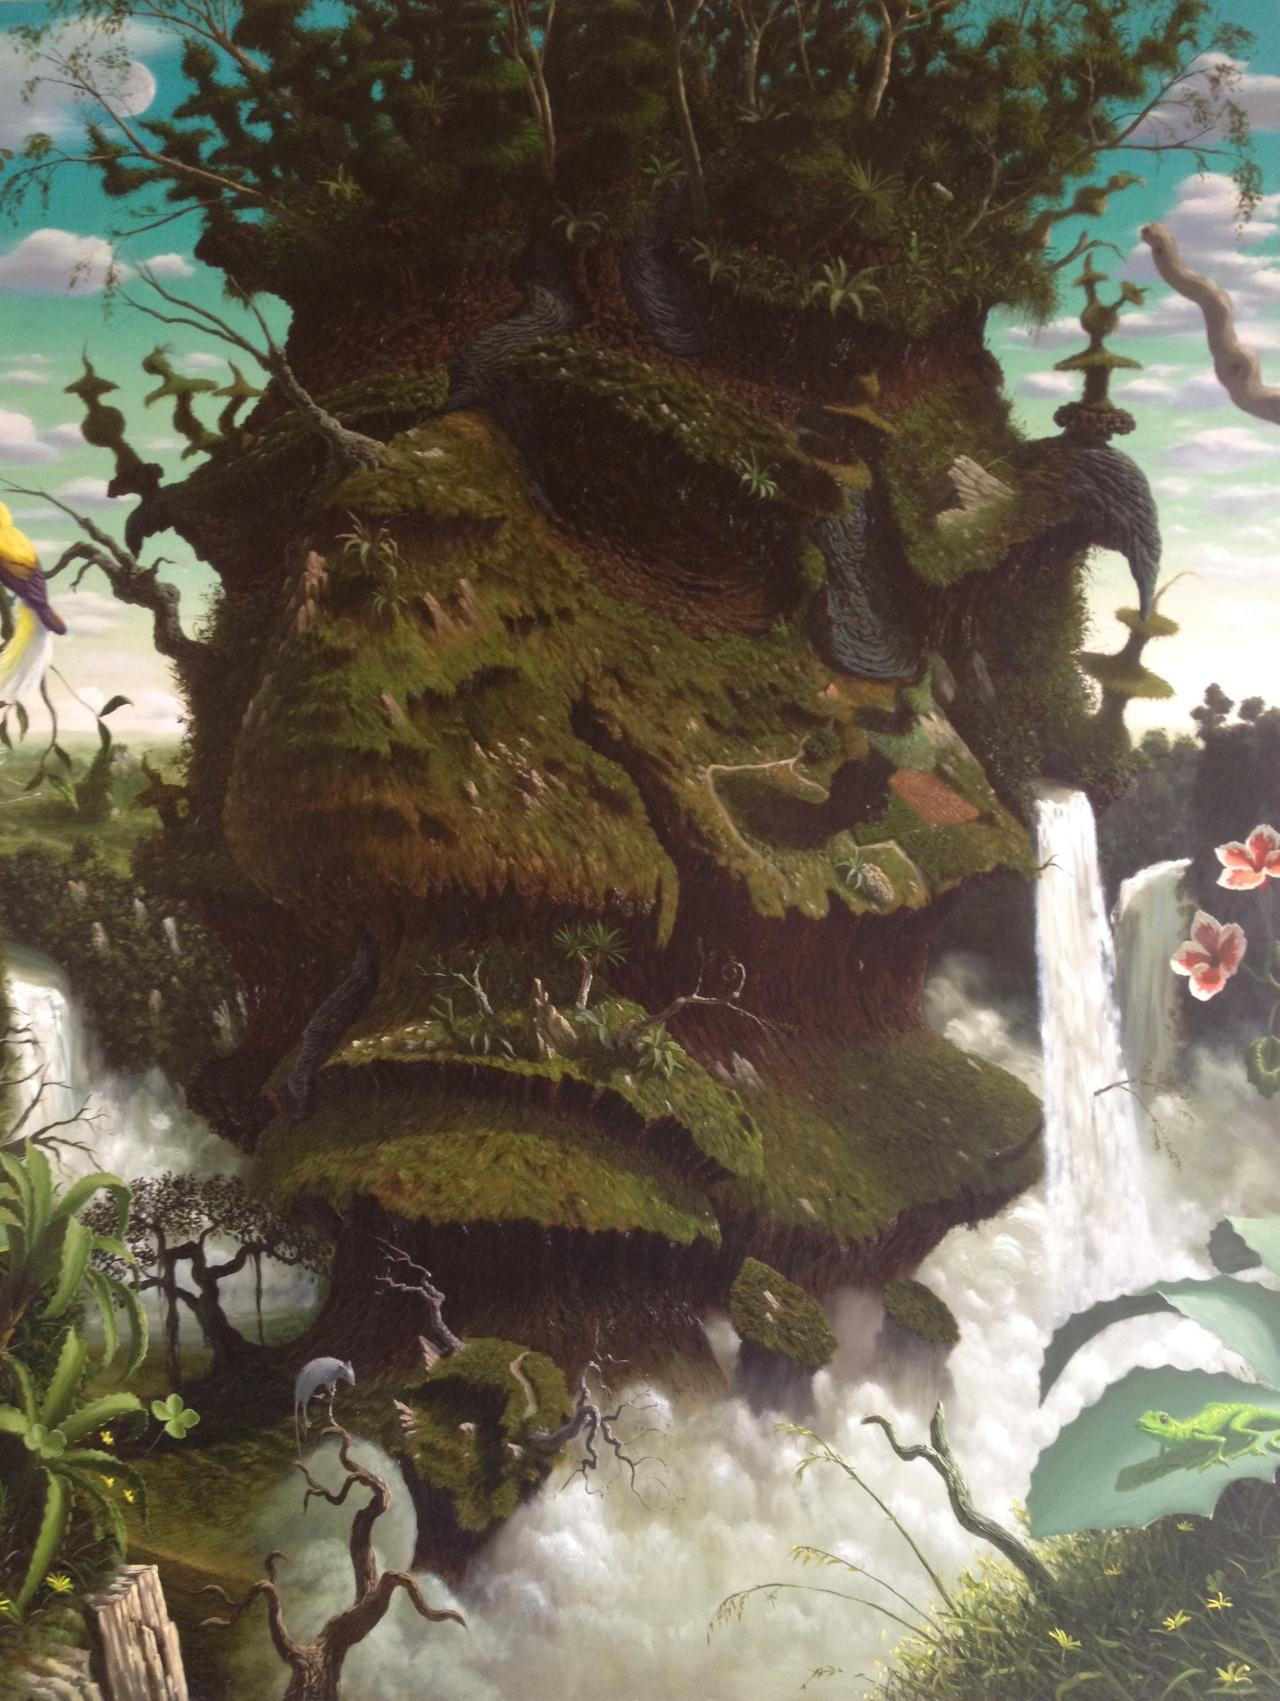 Les peintures à l'huile surréalistes de Fulvio Di Piazza